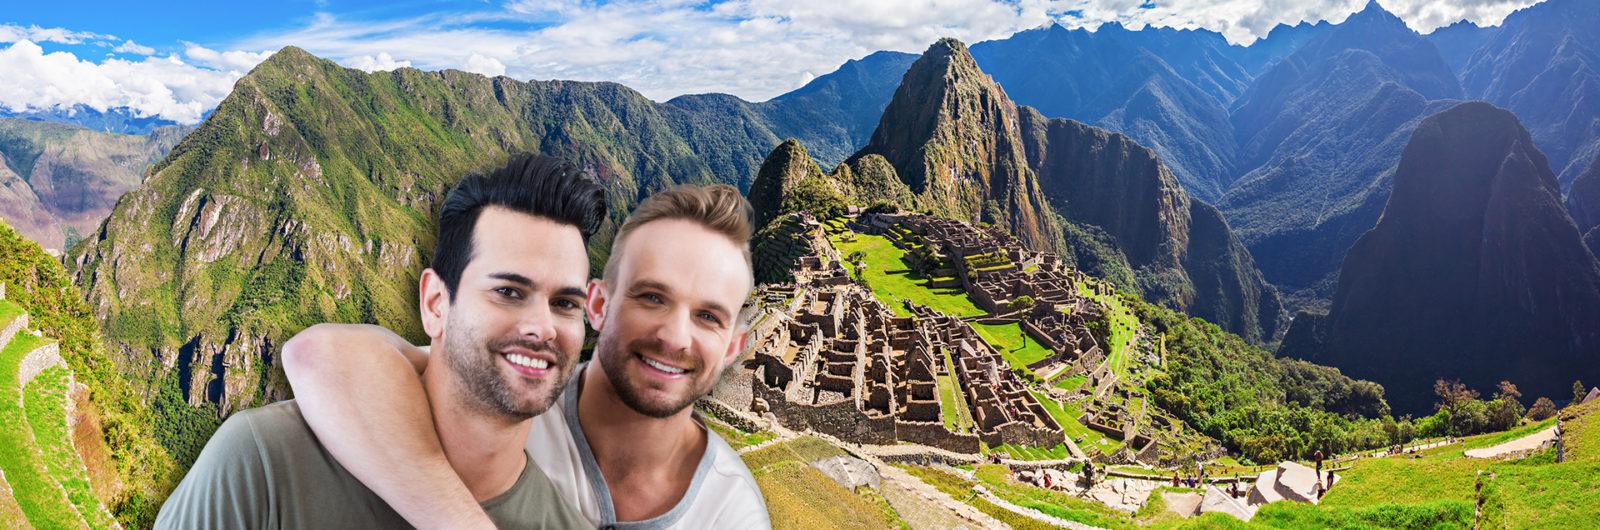 Amazon Cruise Machu Picchu Expedition